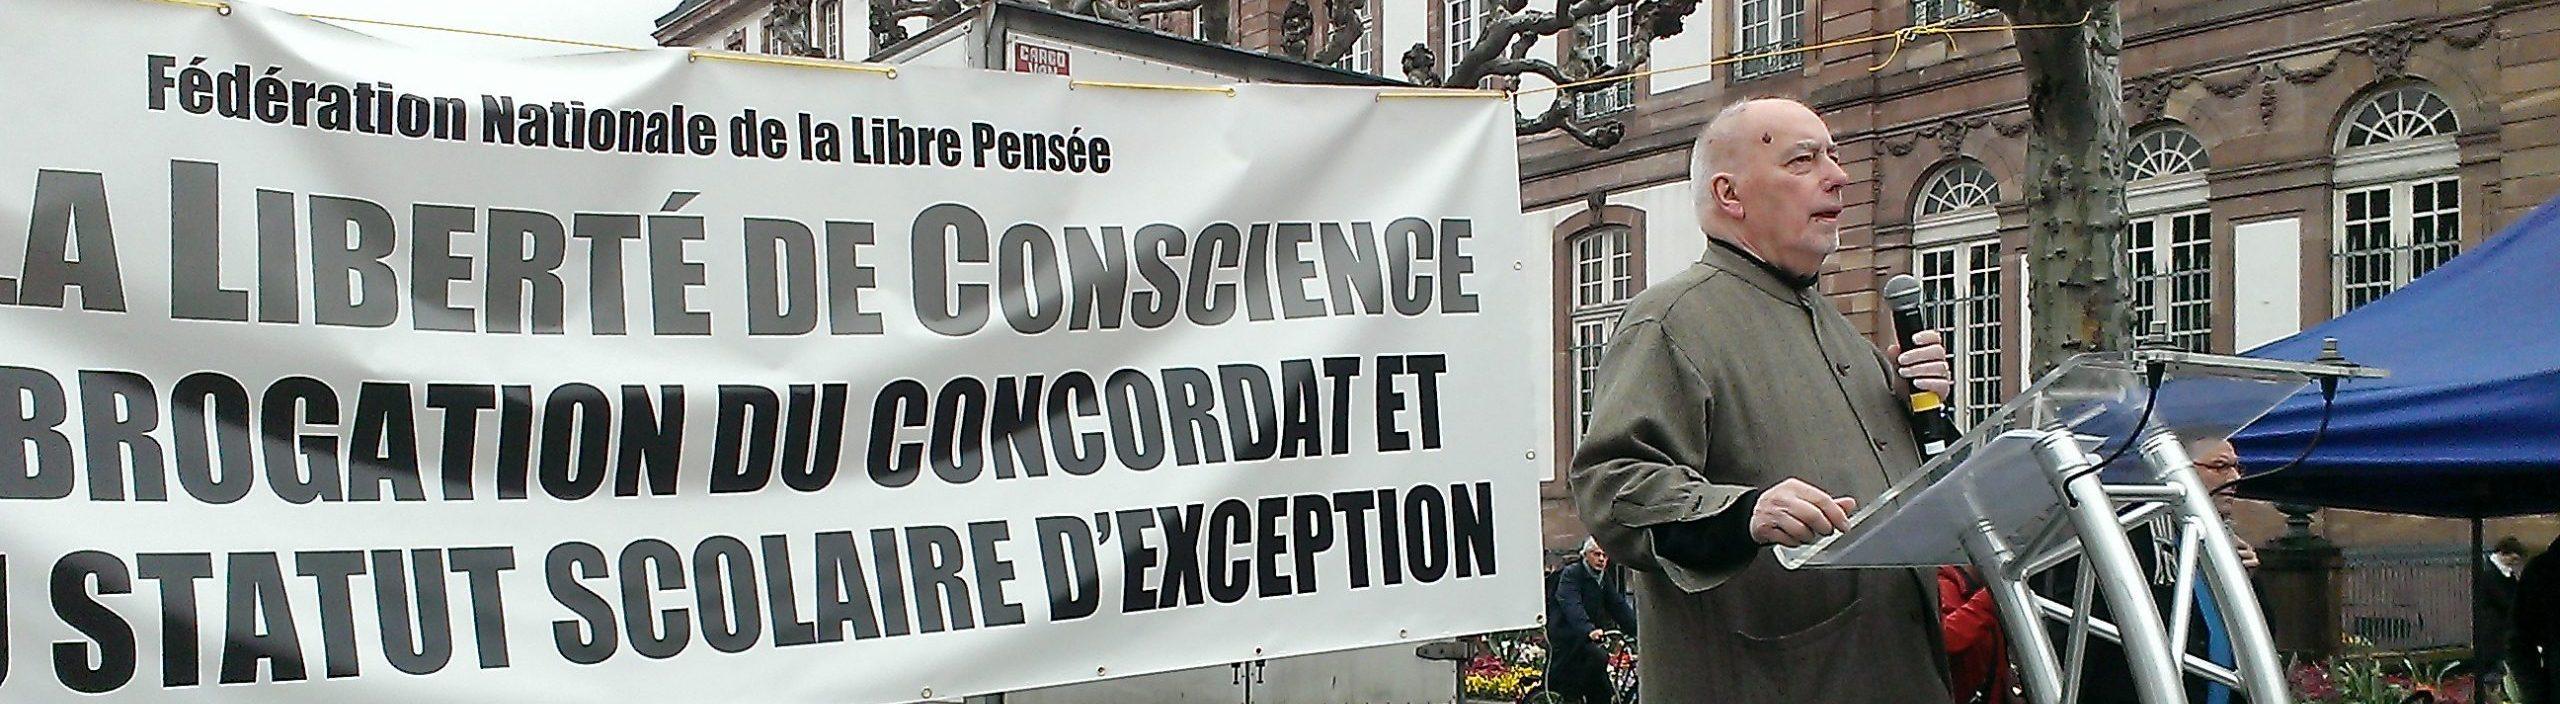 Strasbourg mai 2013